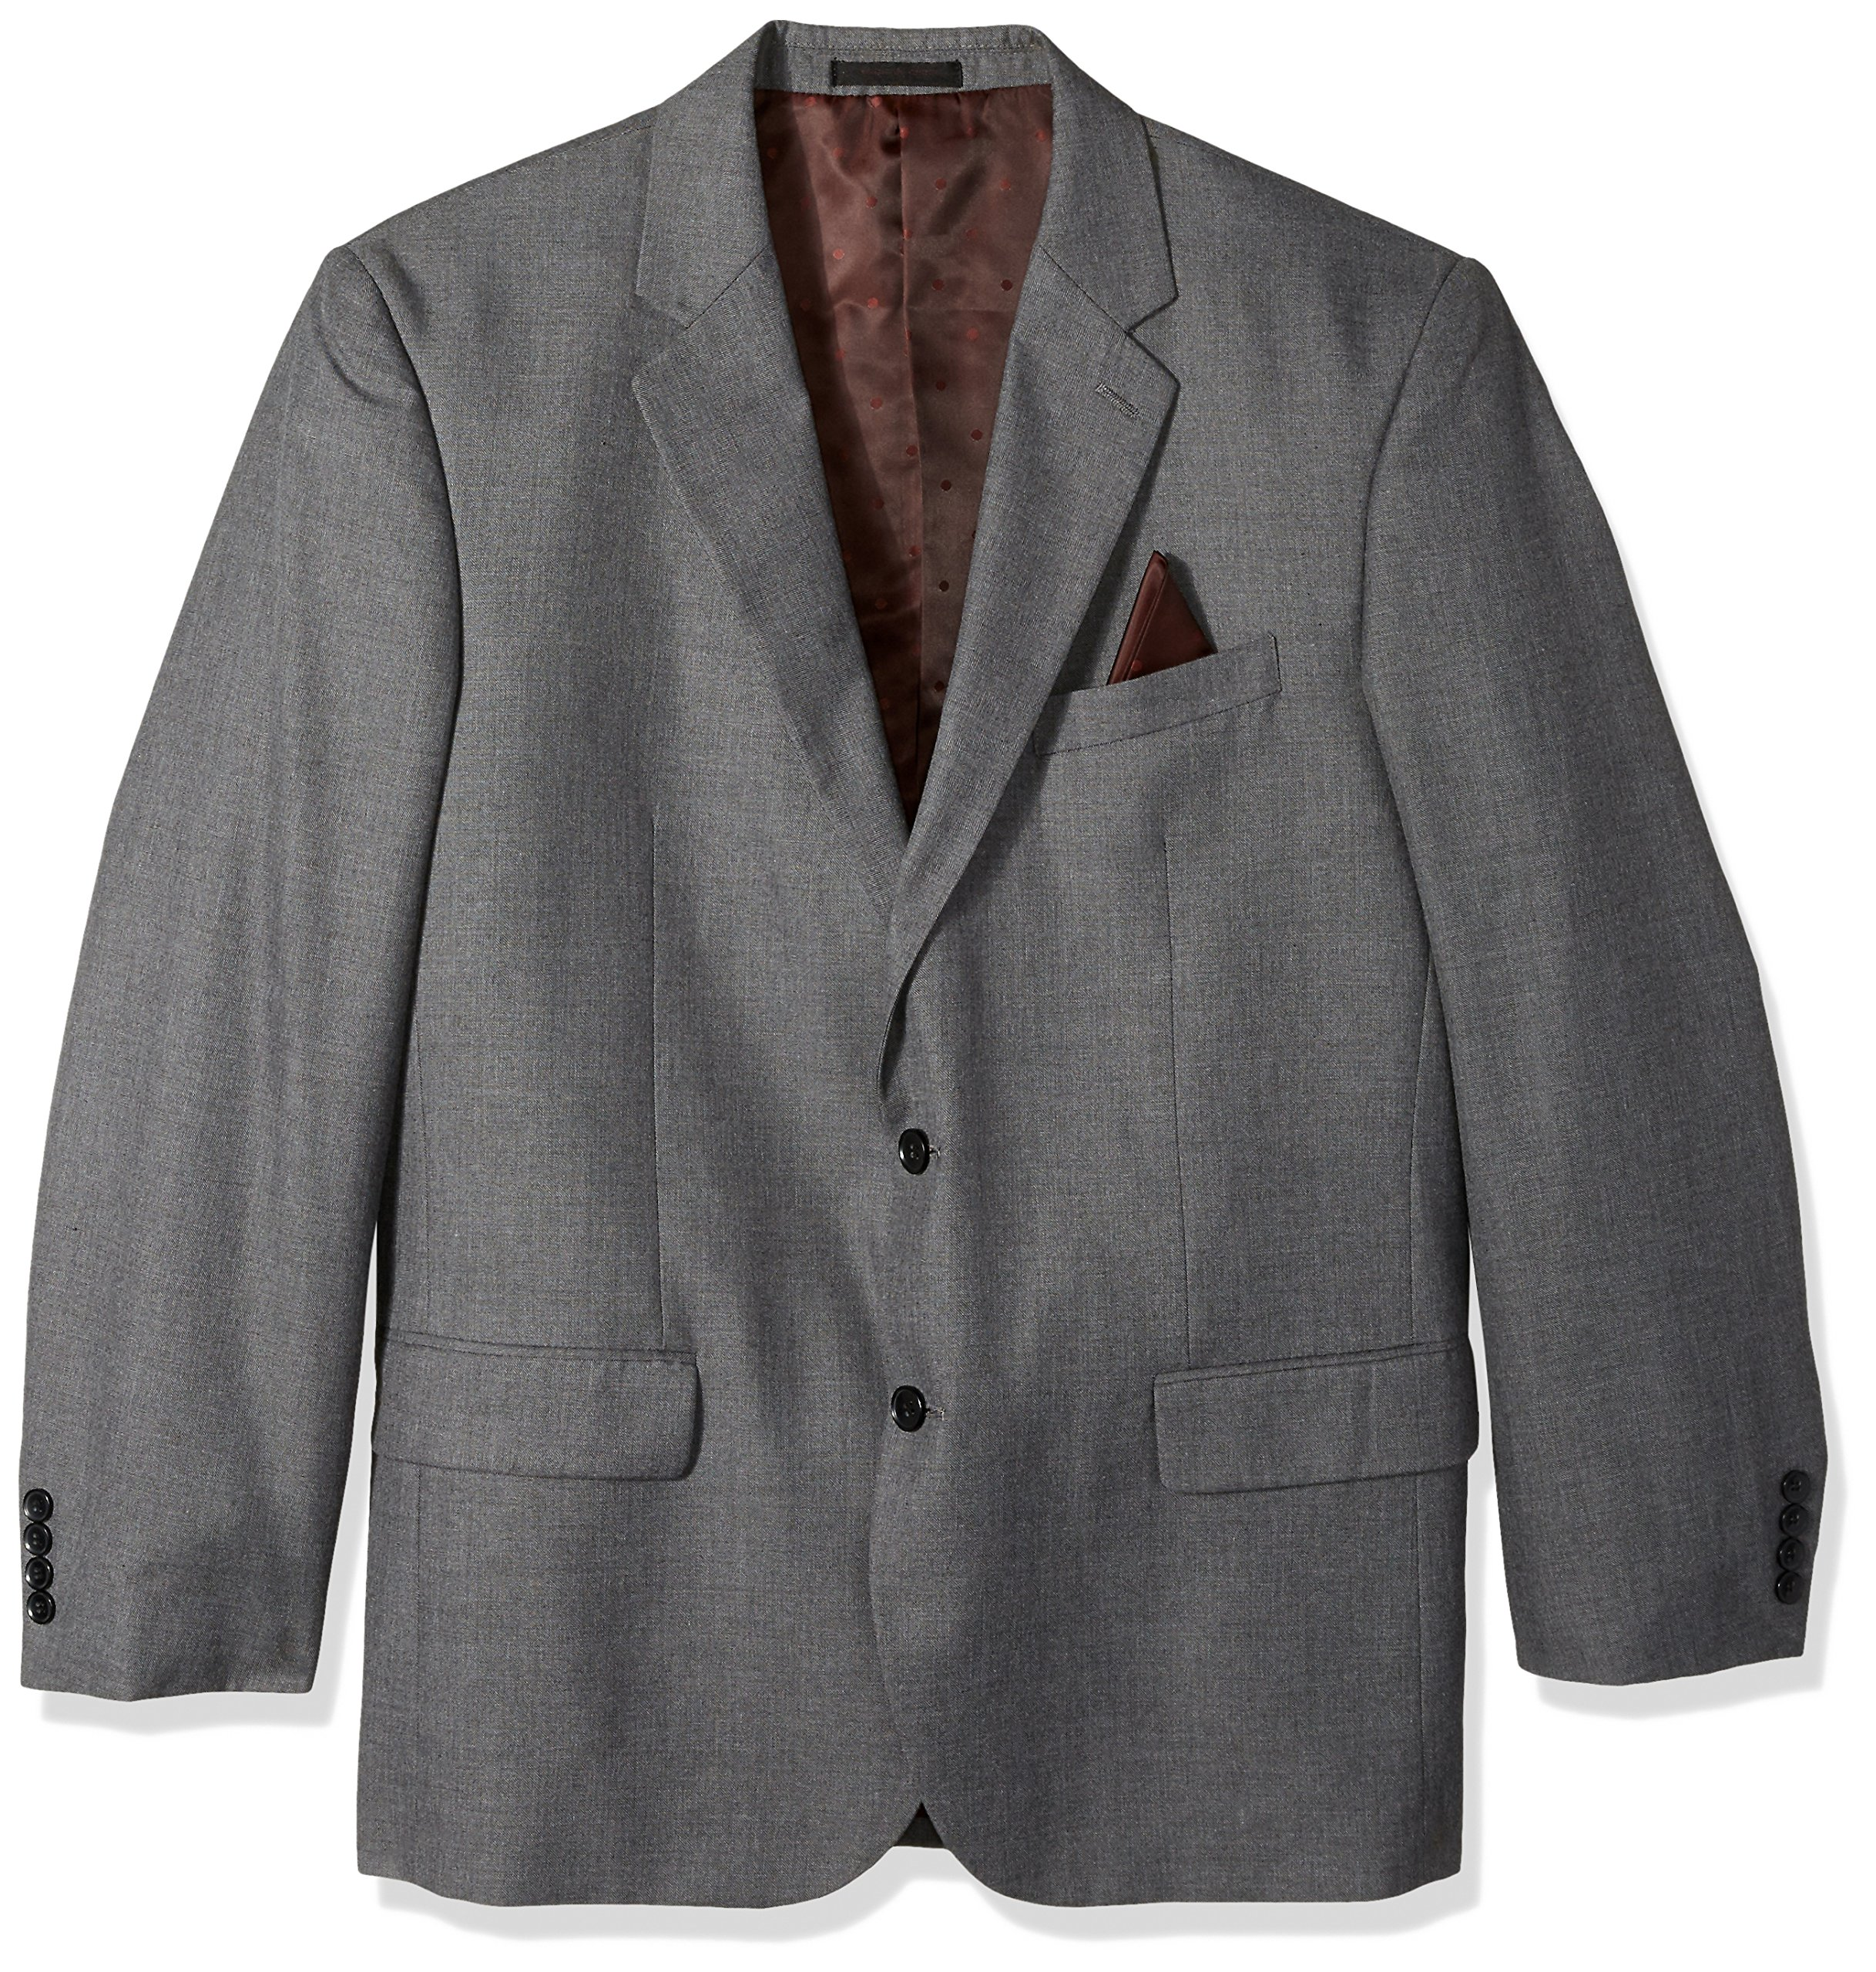 Alexander Julian Colours Men's Big and Tall Single Breasted Modern Fit 2 Button Notch Lapel Suit Separate Jacket, Dark Gray Sharkskin, 56 Long